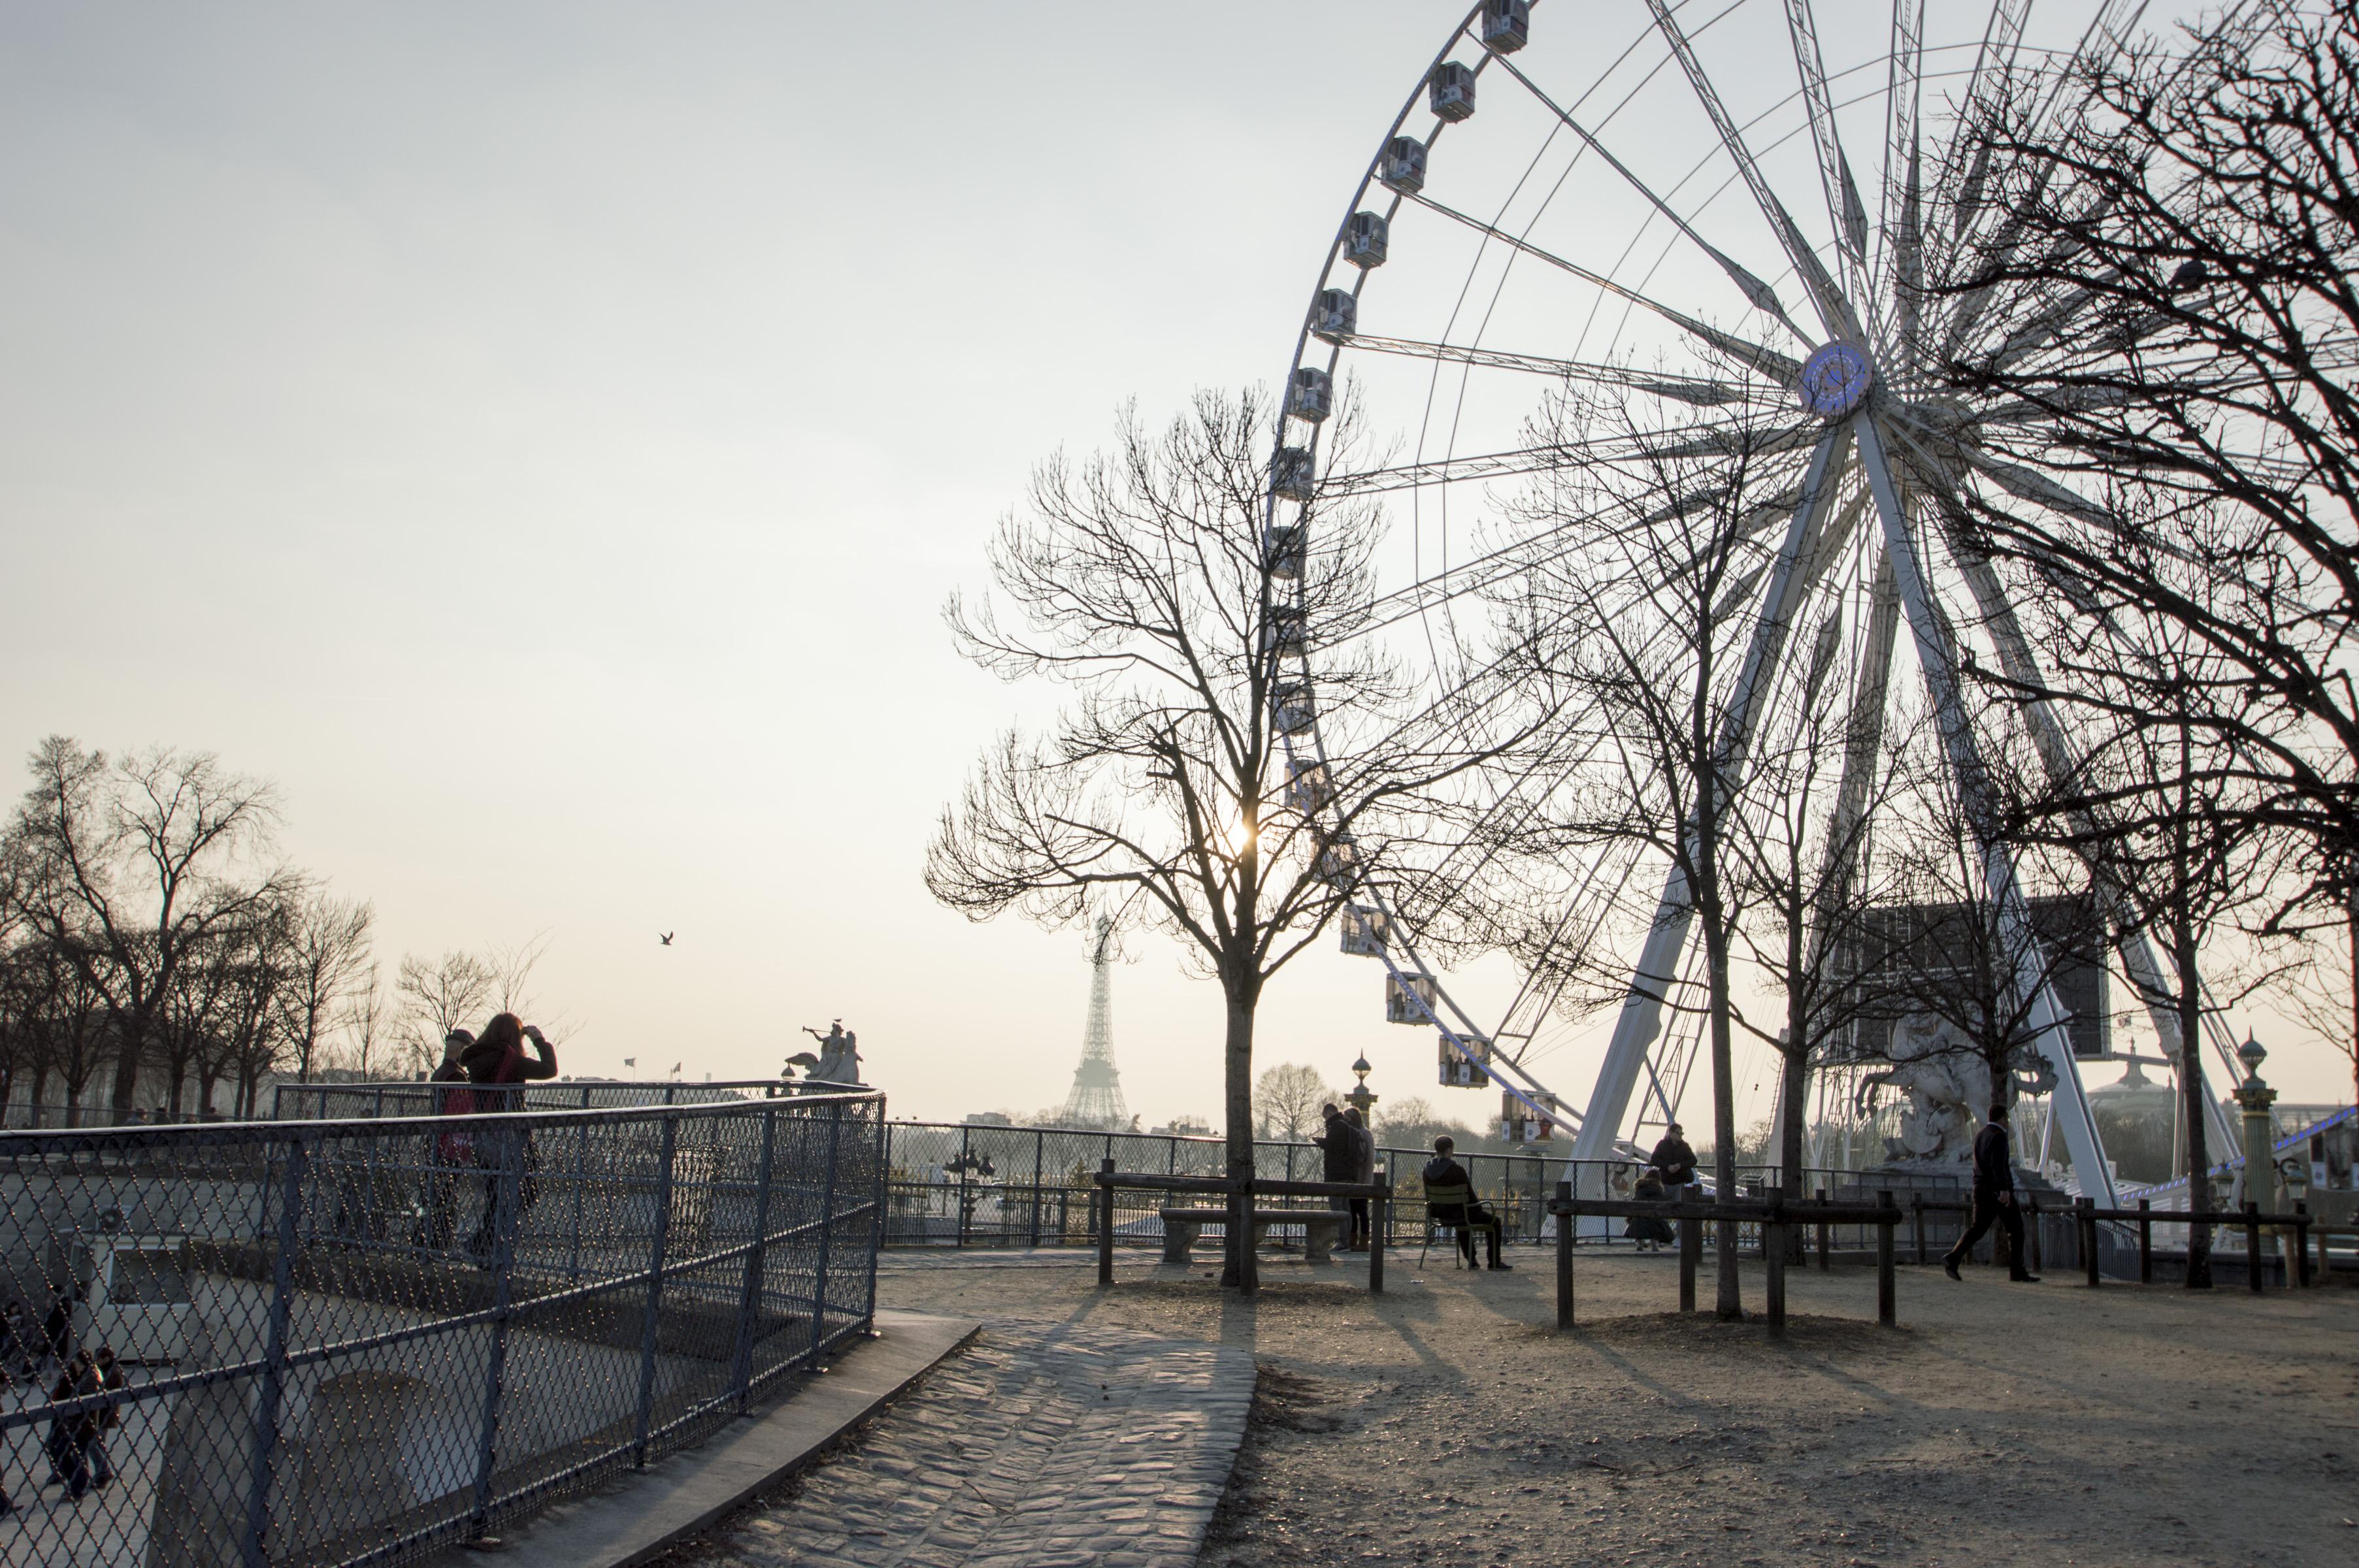 The City of Light - Paris, France